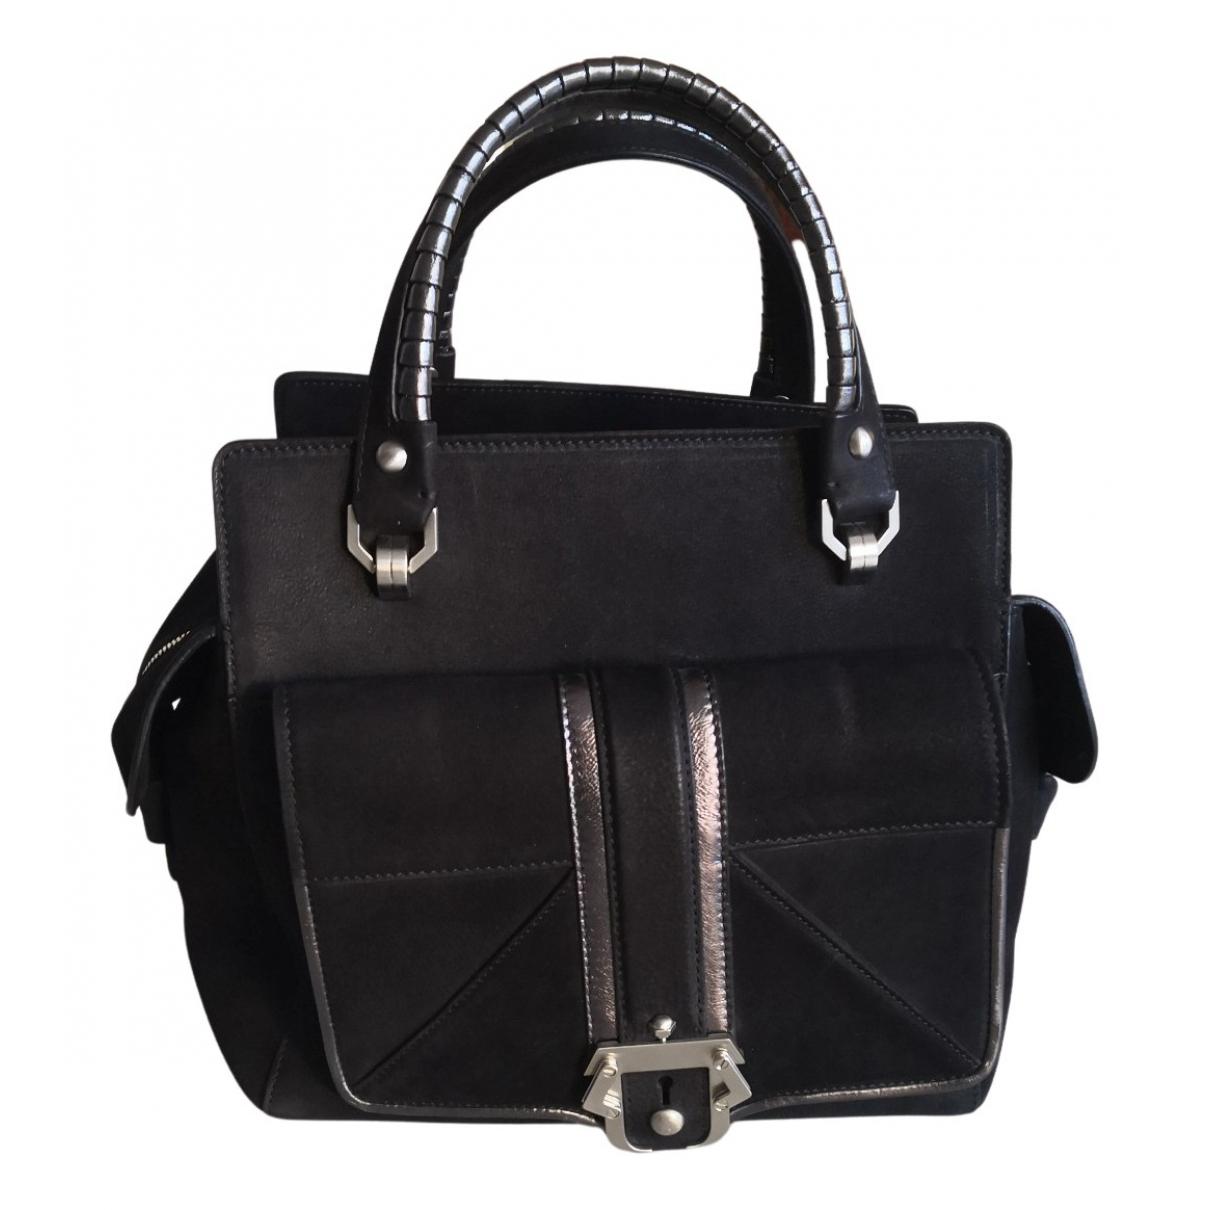 Paula Cademartori N Black Leather handbag for Women N